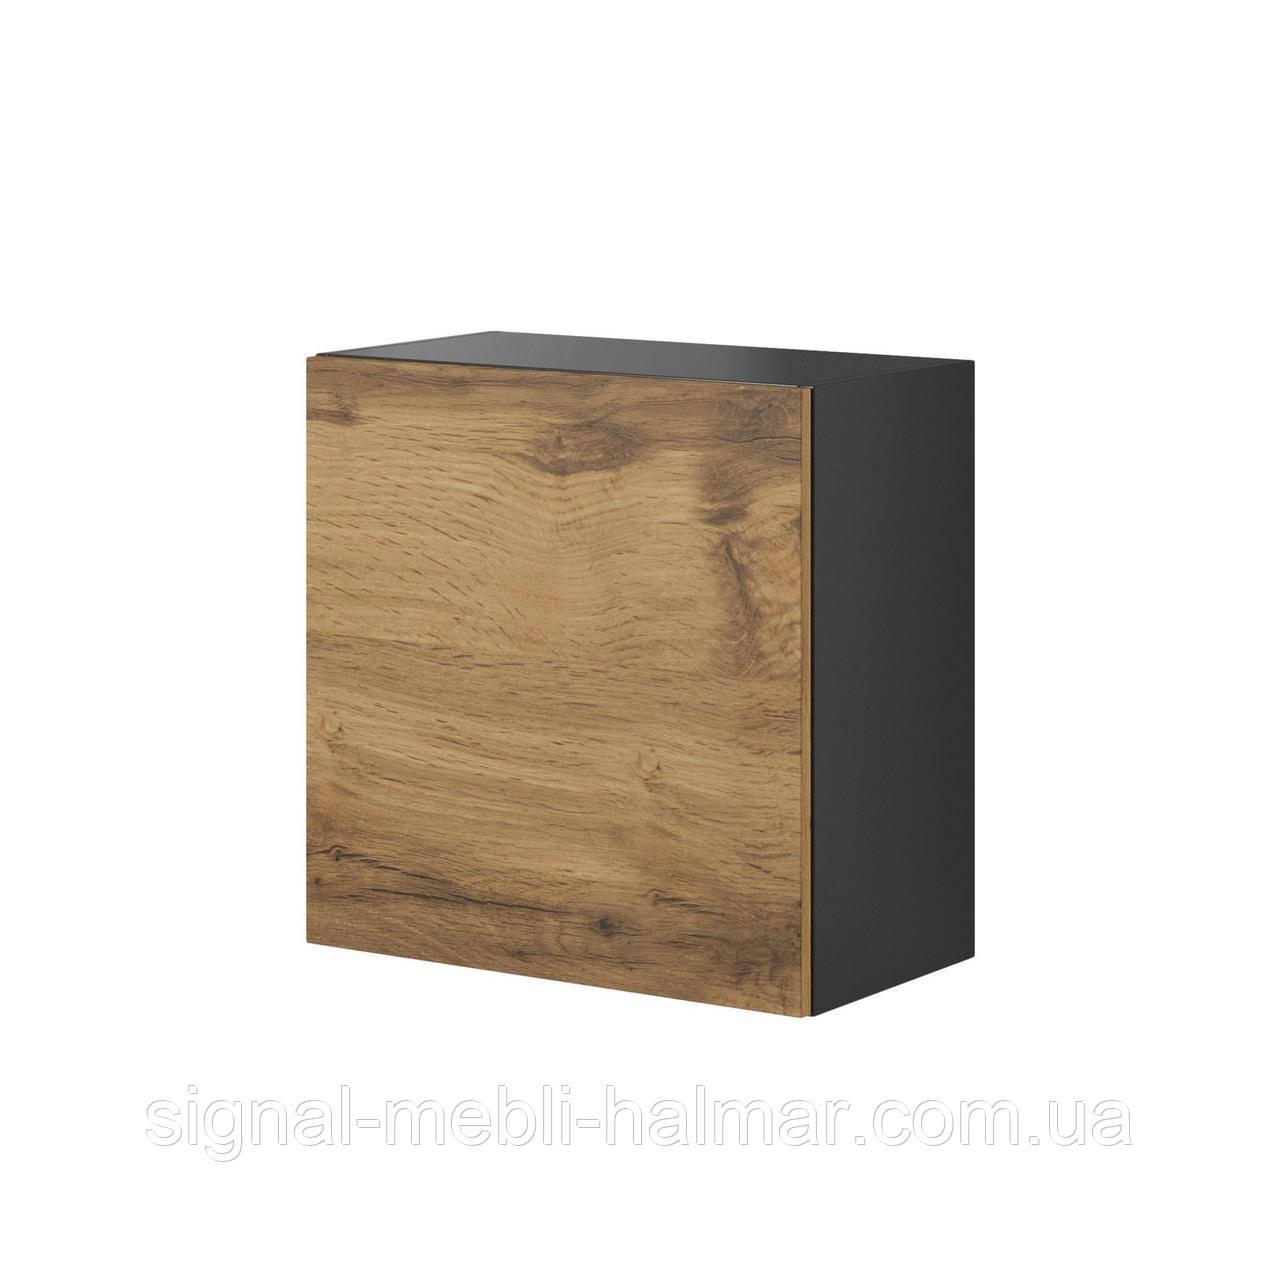 Настенный шкаф Livo W-55